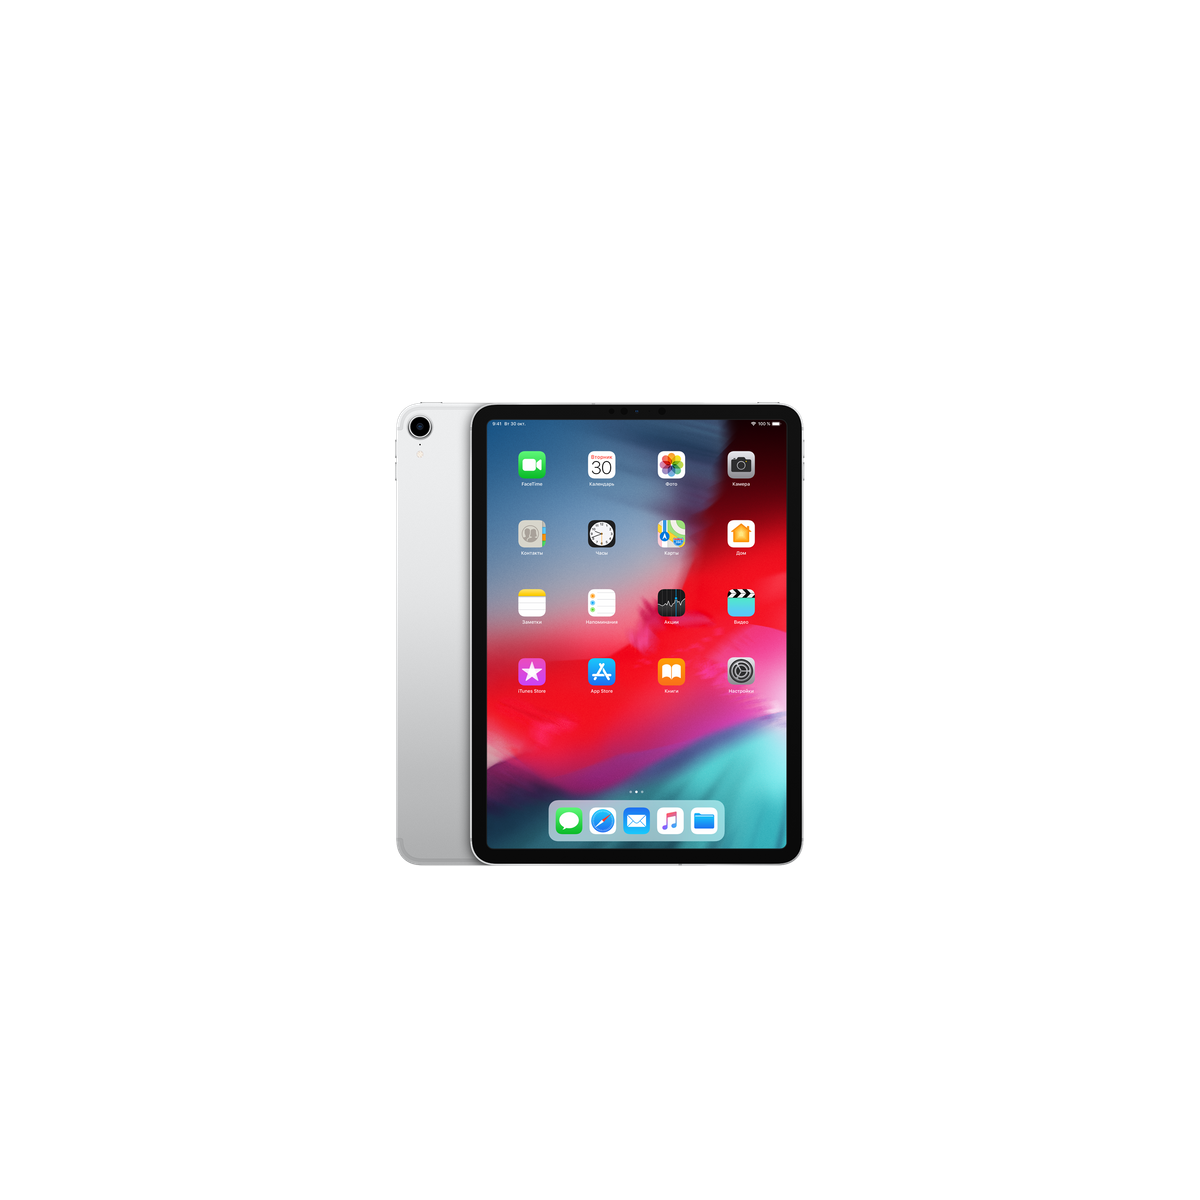 Apple iPad Pro 11 2018 Wi-Fi + LTE 512GB Silver